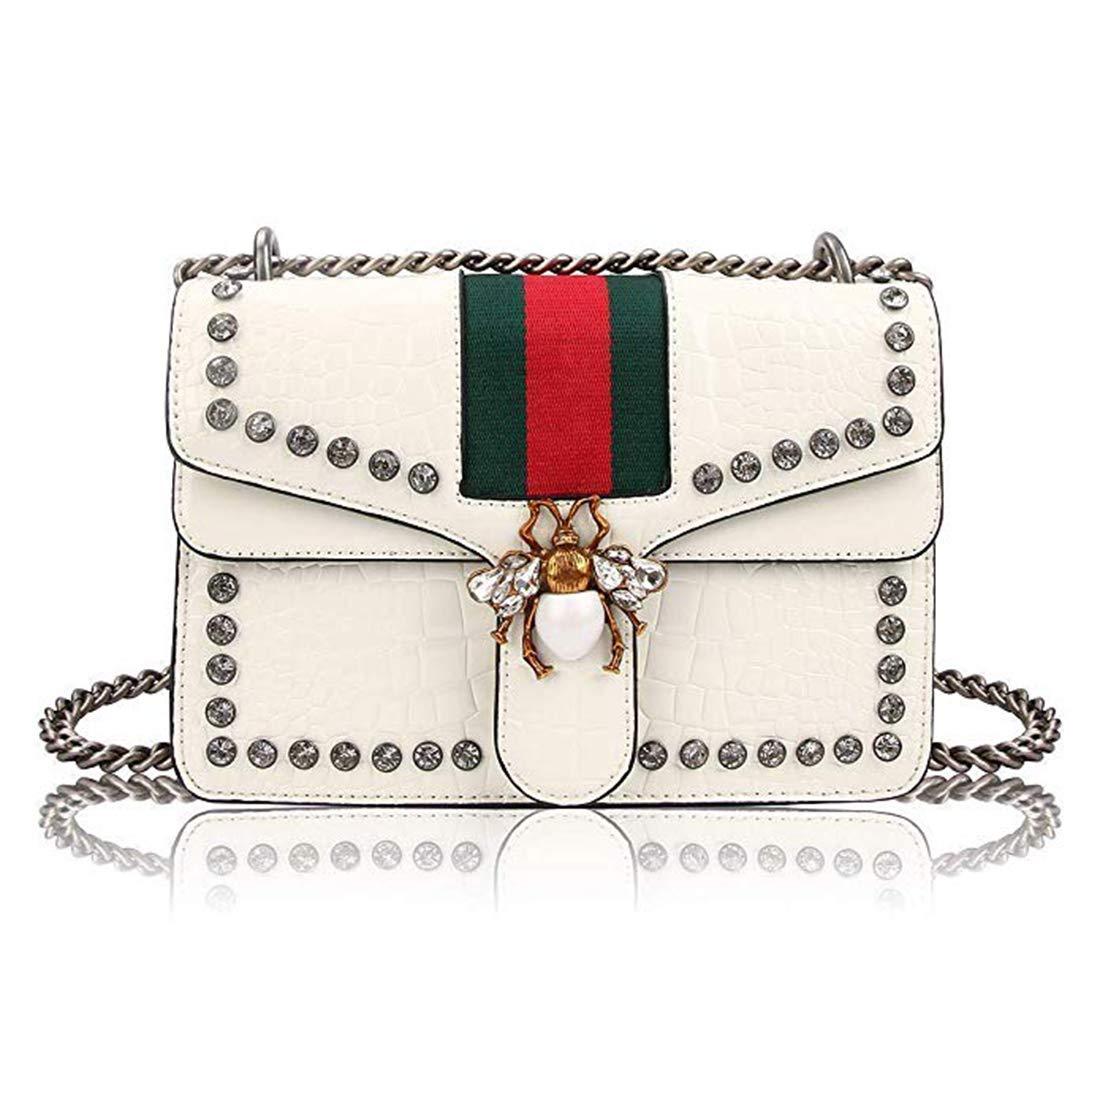 Women Evening Crossbody Bag, Designer Shoulder Bag for Women, Fashion Bee Crossbody Bag Handbags with Chain (Bright White)